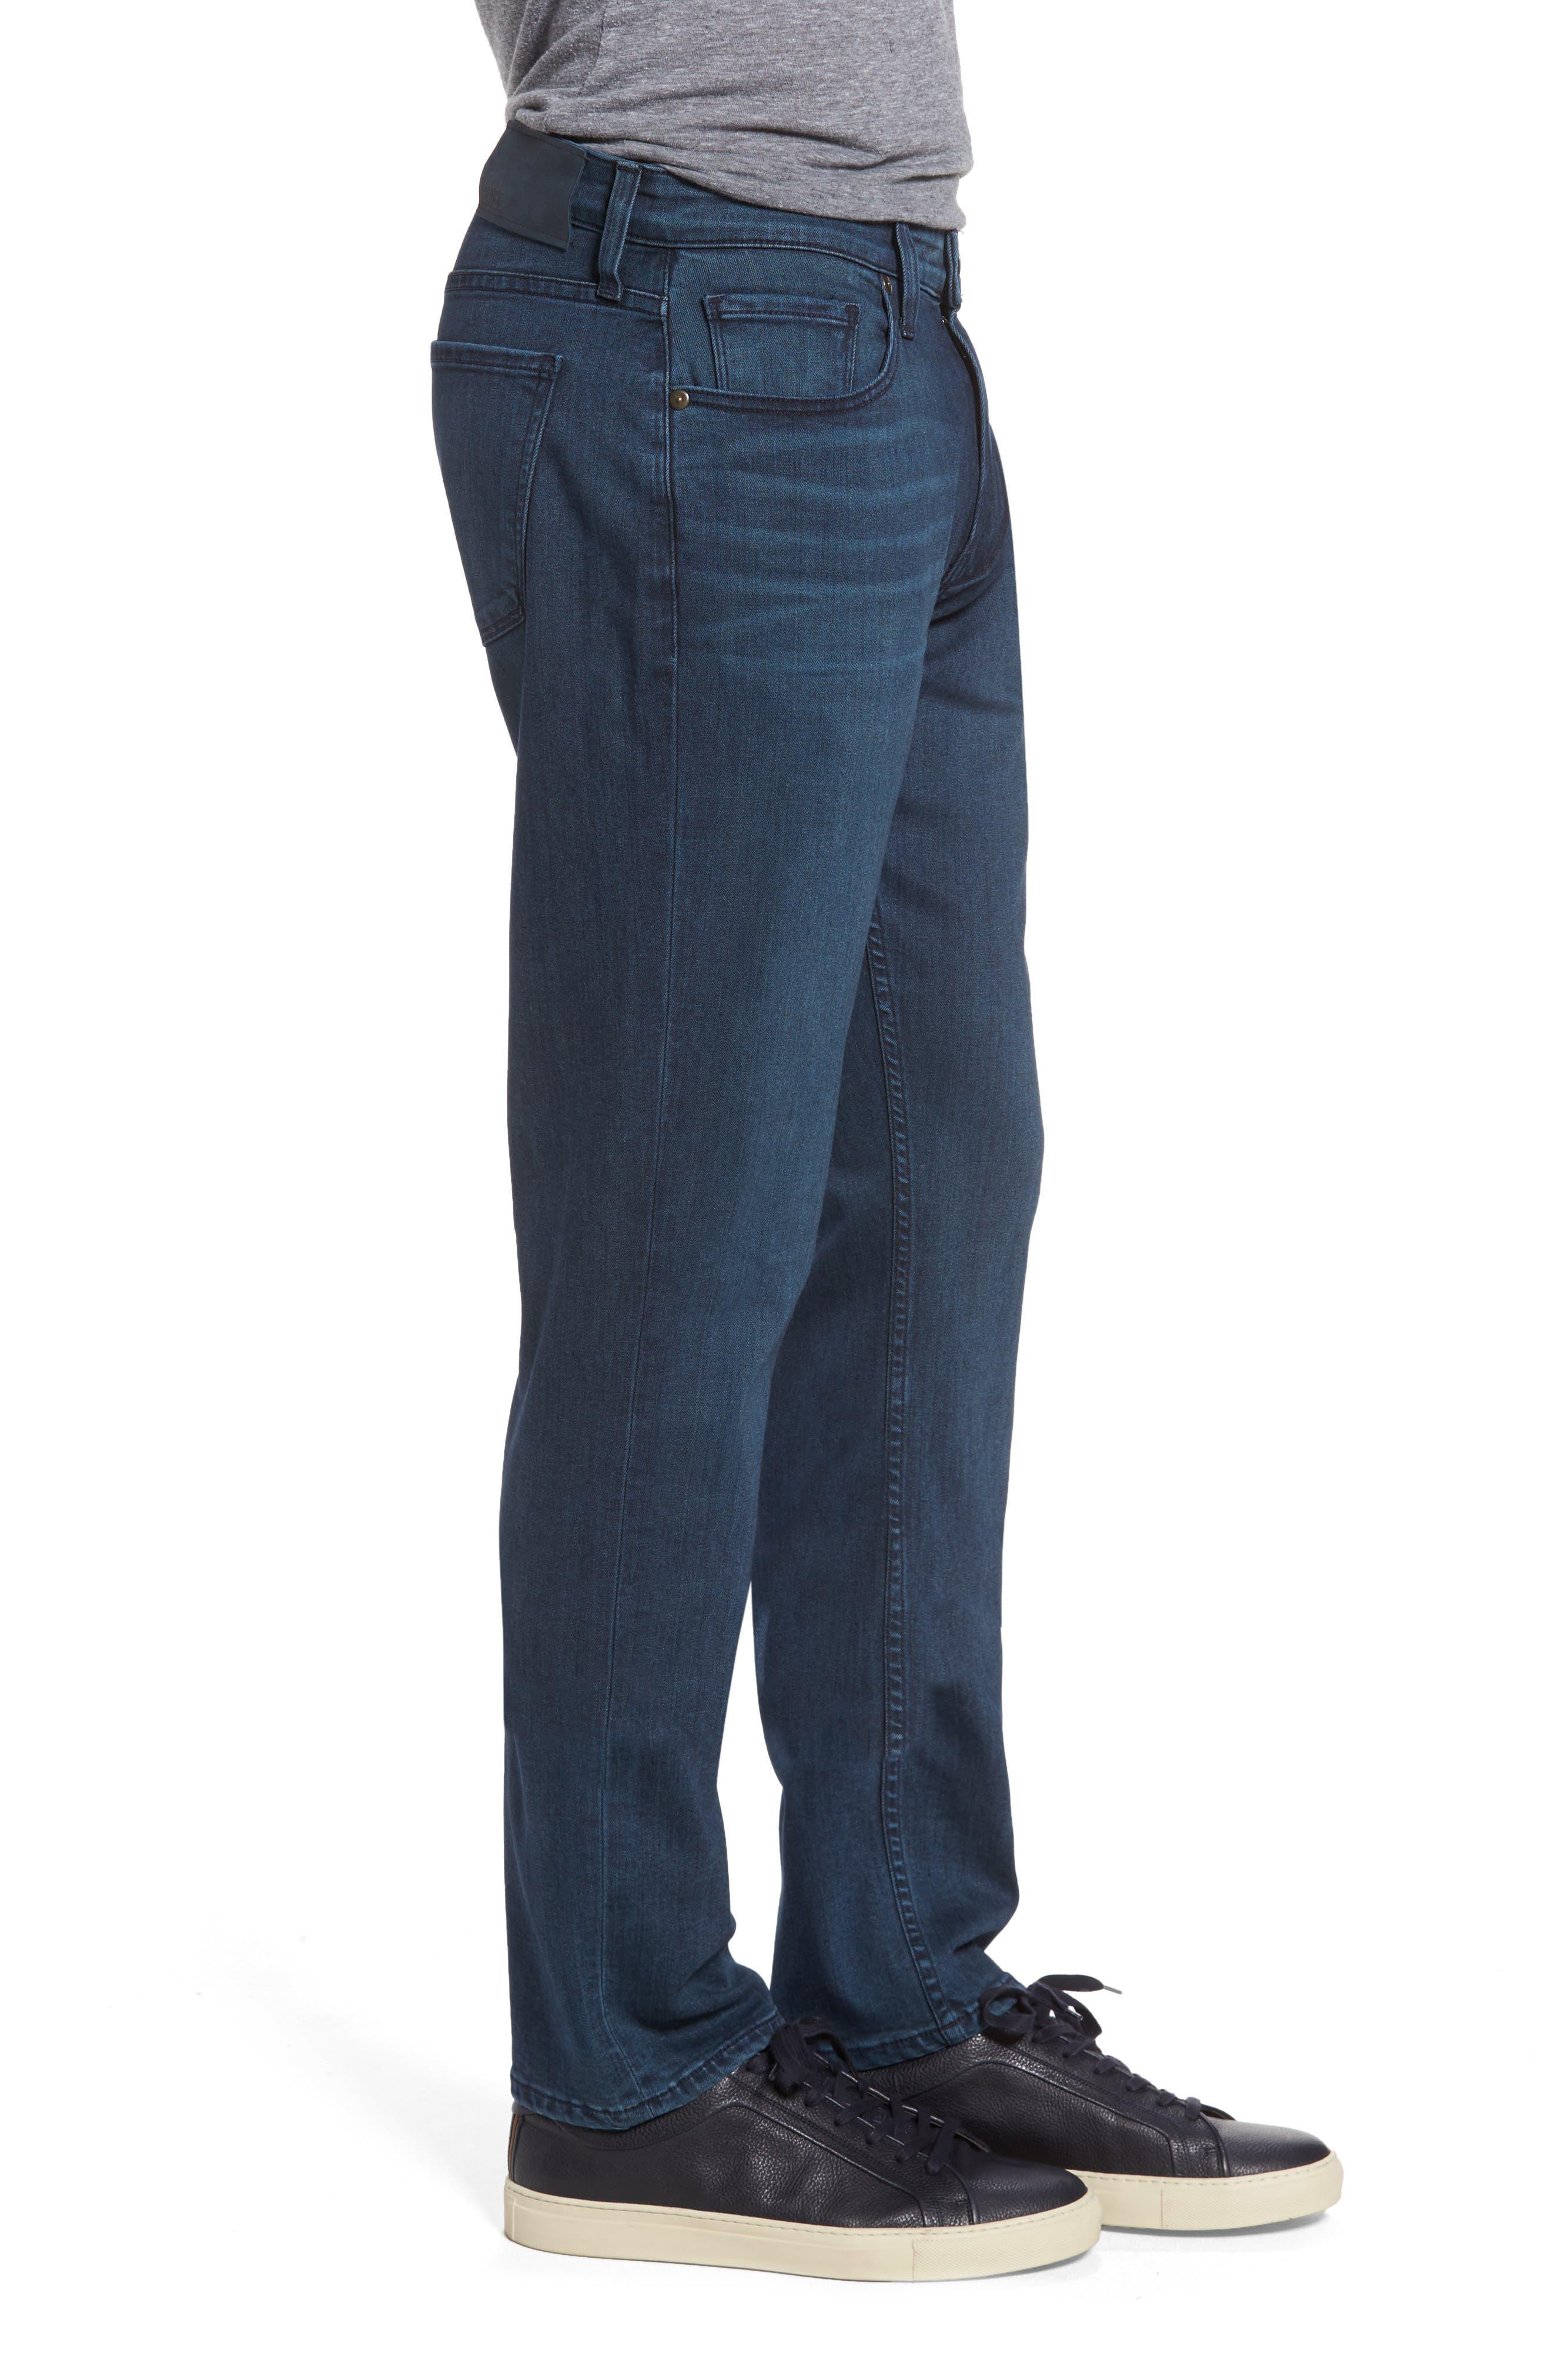 Transcend - Federal Slim Straight Fit Jeans,                             Alternate thumbnail 3, color,                             400